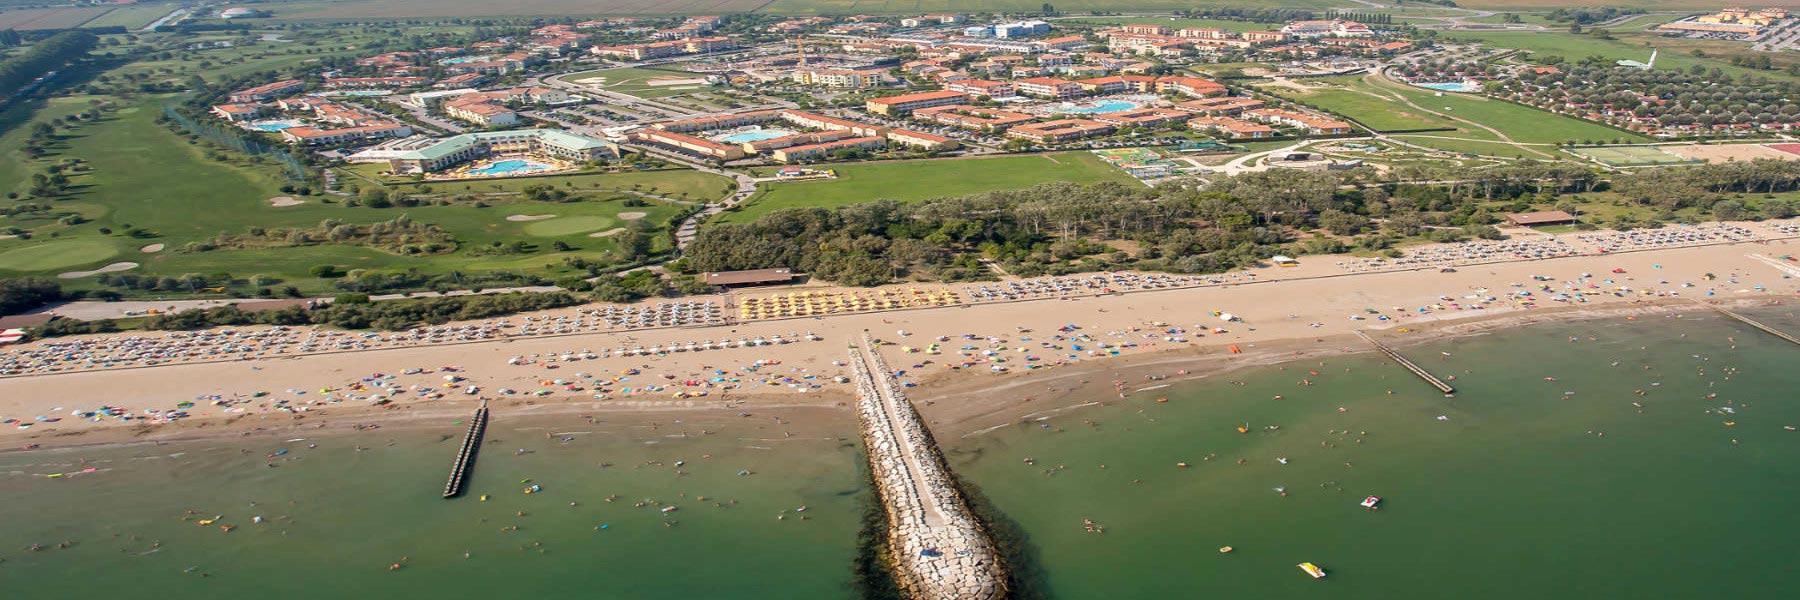 Santa Margherita Hotels